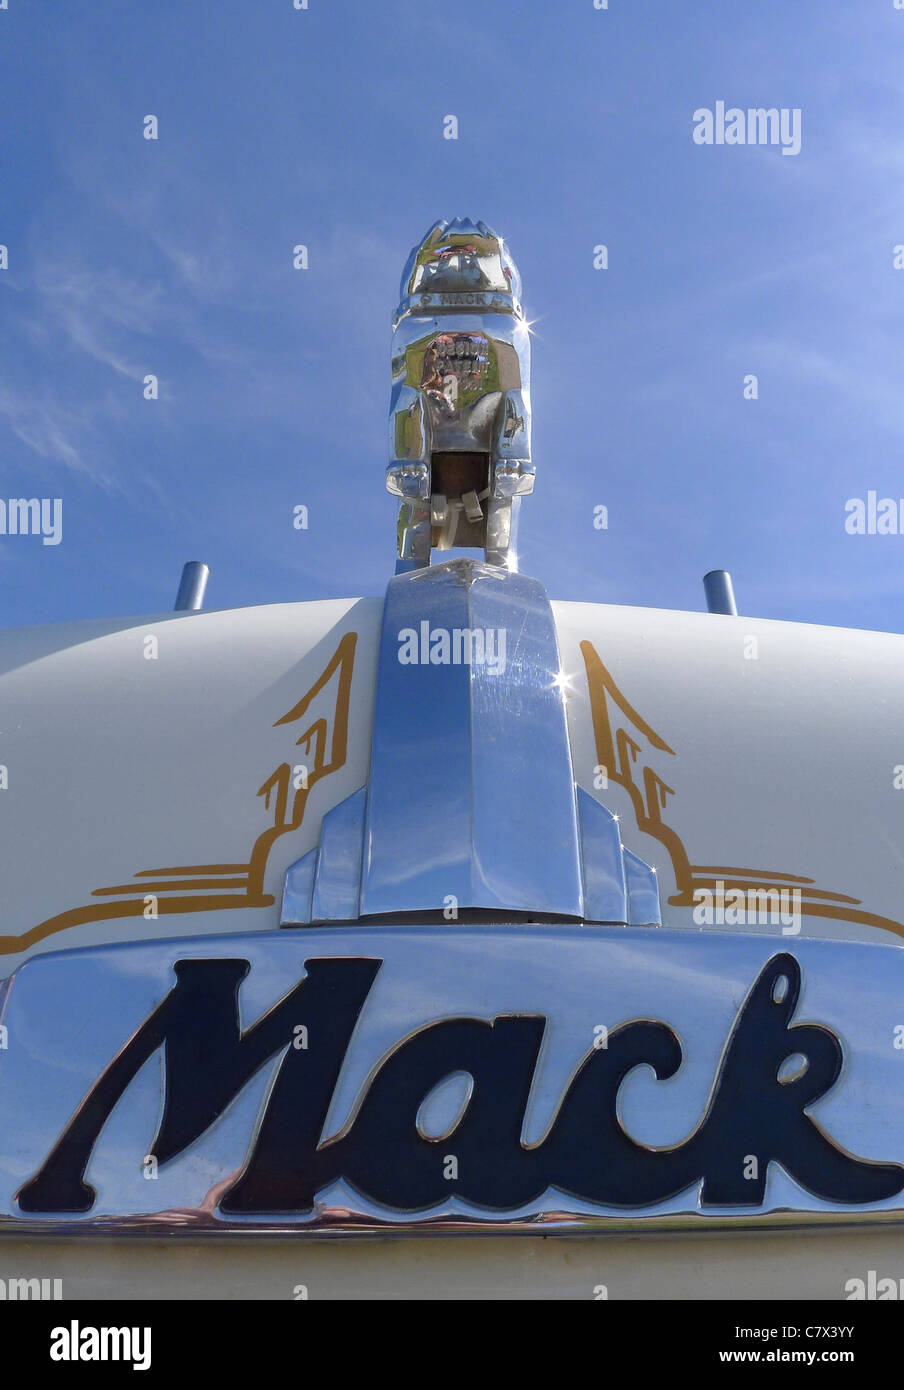 Mack Logo Stock Photos Mack Logo Stock Images Alamy